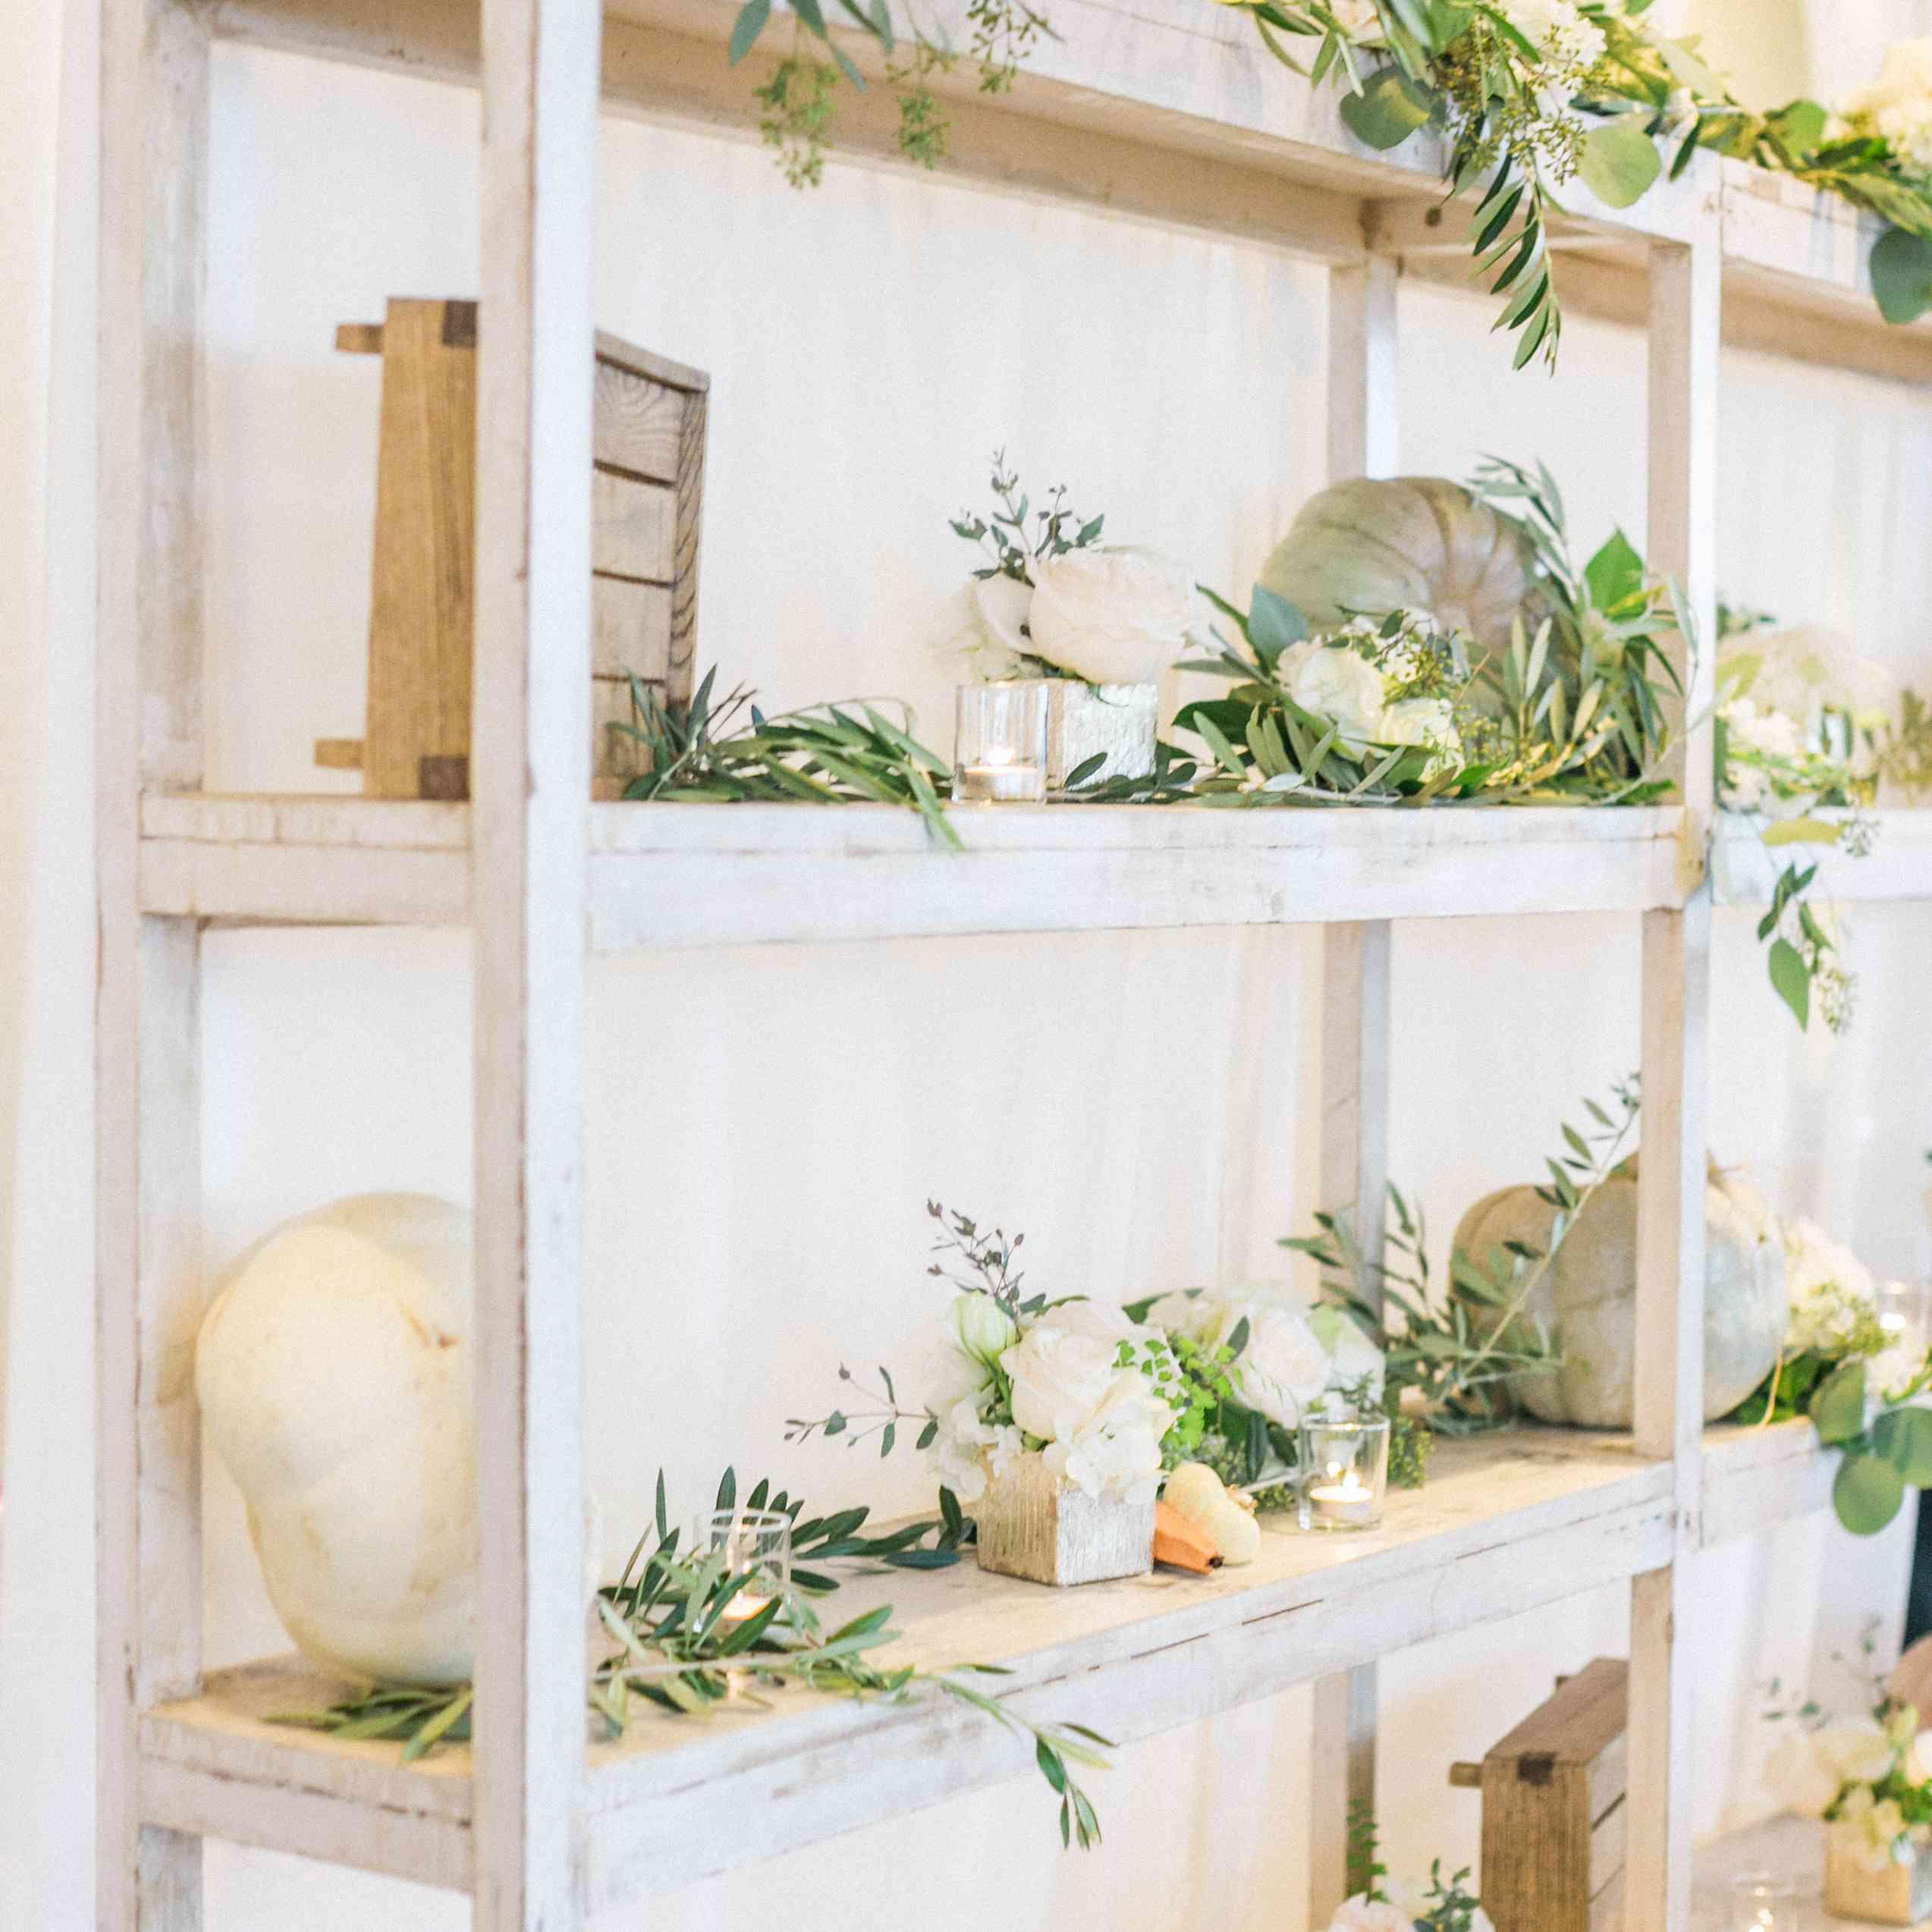 Fall decor shelves